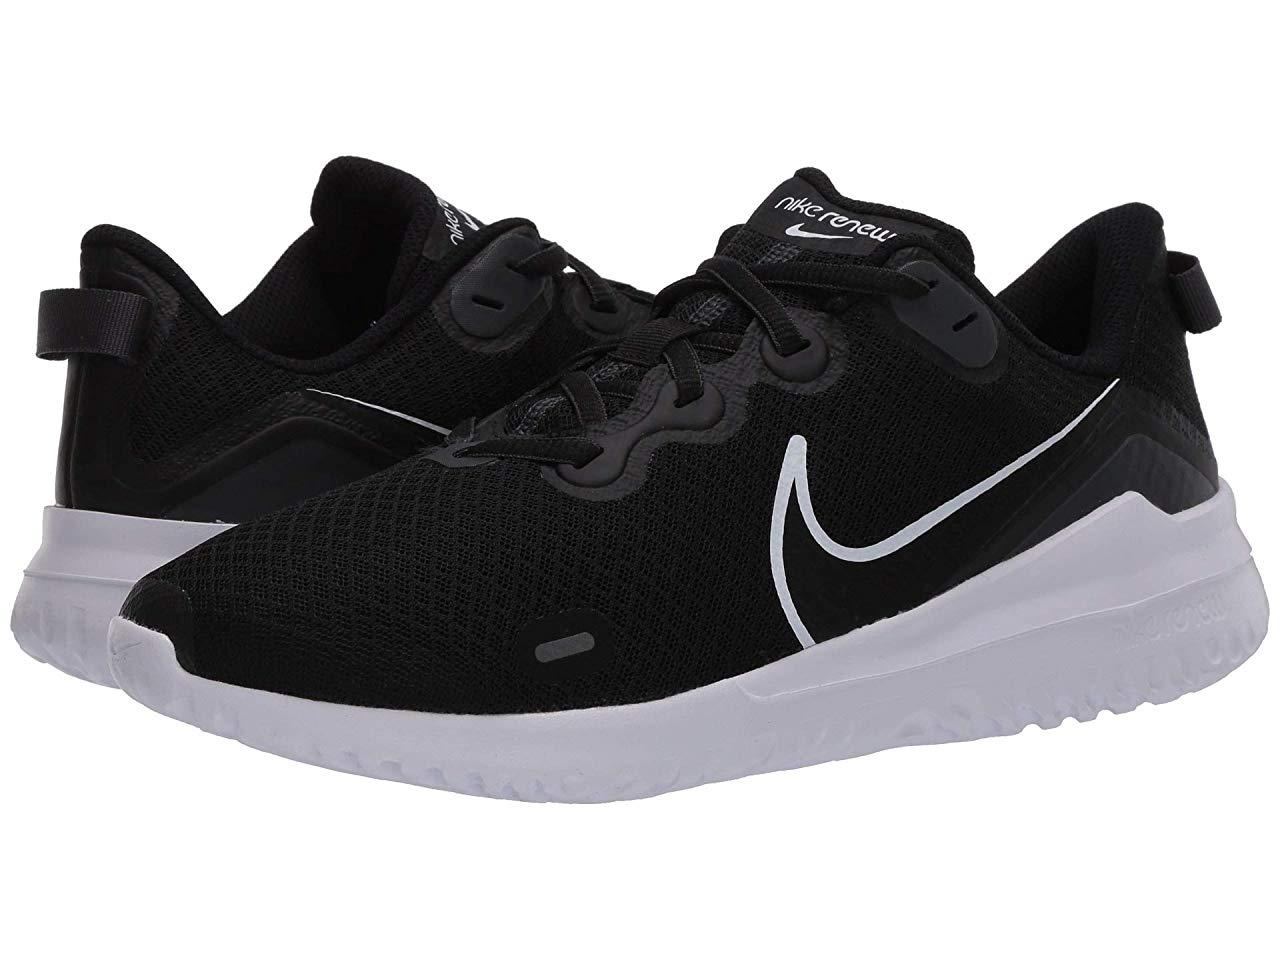 Кроссовки/Кеды Nike Renew Ride Black/White/Dark Smoke Grey